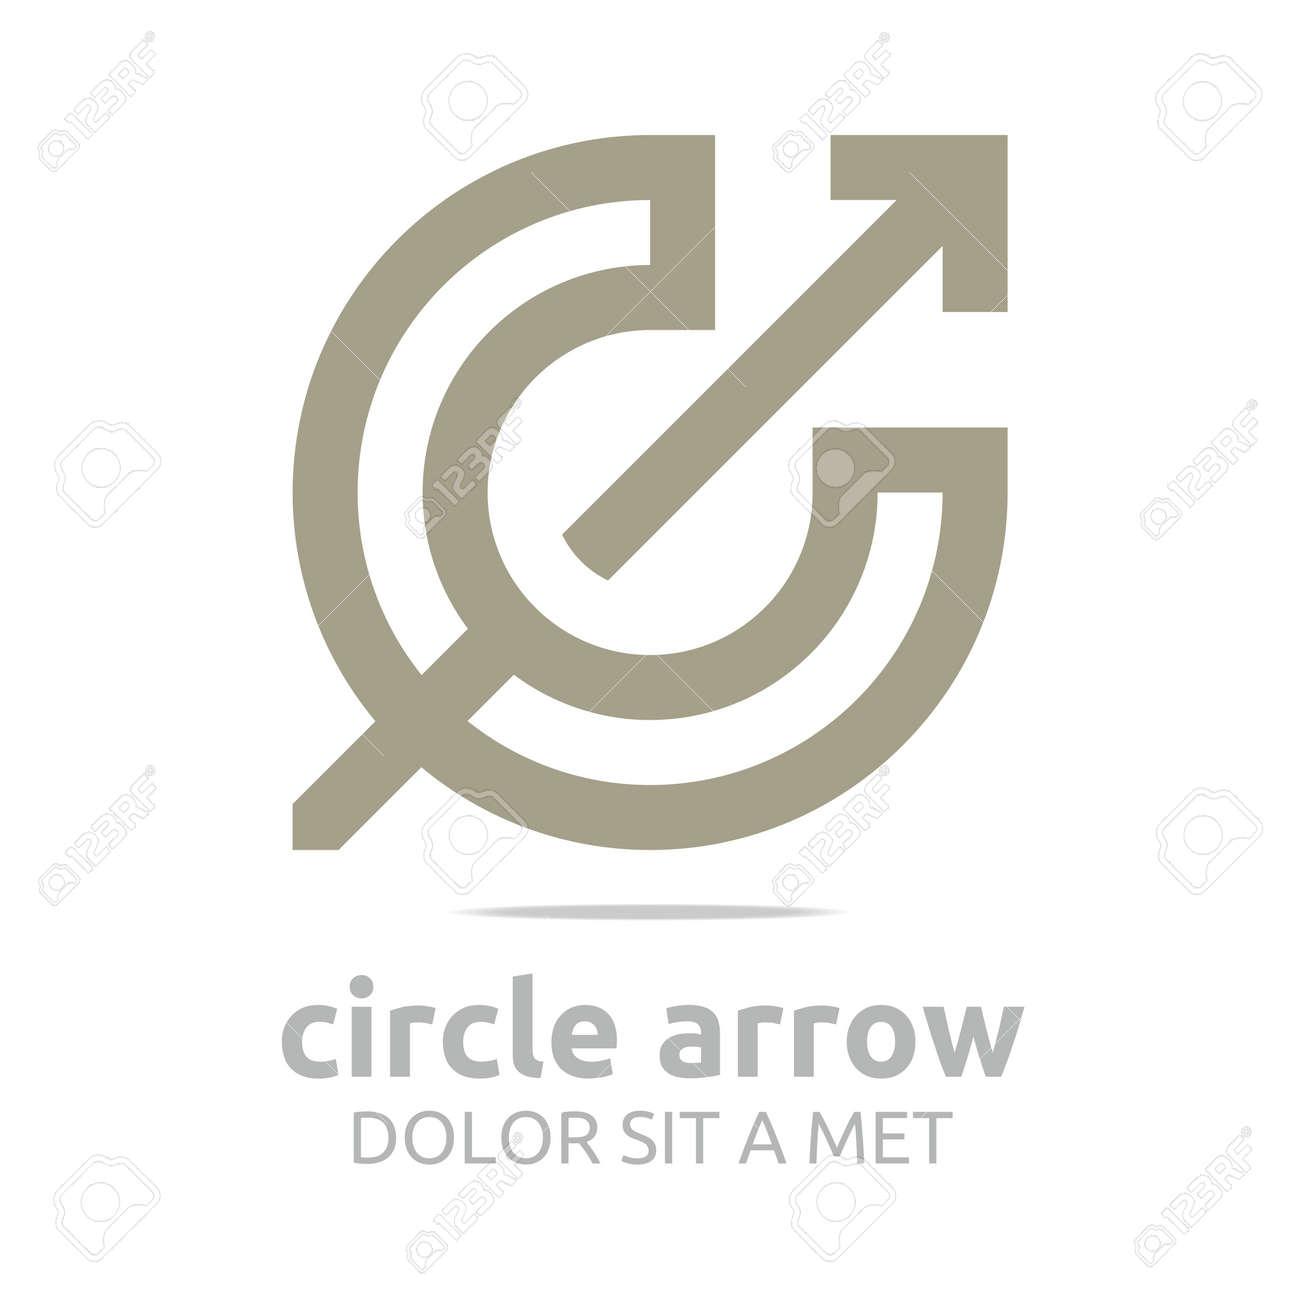 Logo design letter c arrow brown icon symbol abstract vector royalty logo design letter c arrow brown icon symbol abstract vector stock vector 45413091 biocorpaavc Images